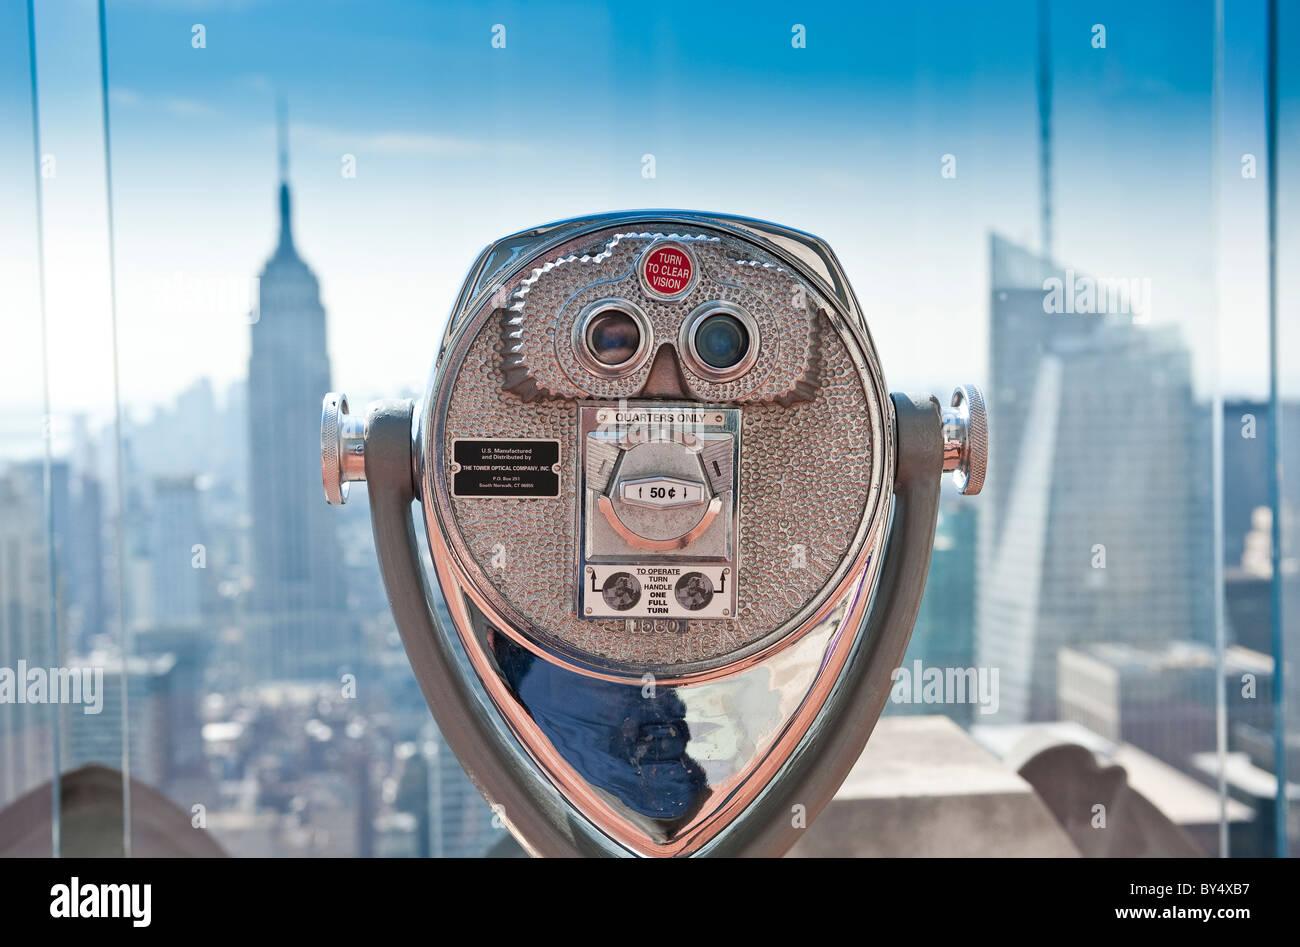 La plate-forme d'observation du Rockefeller Center, New York City. Photo Stock